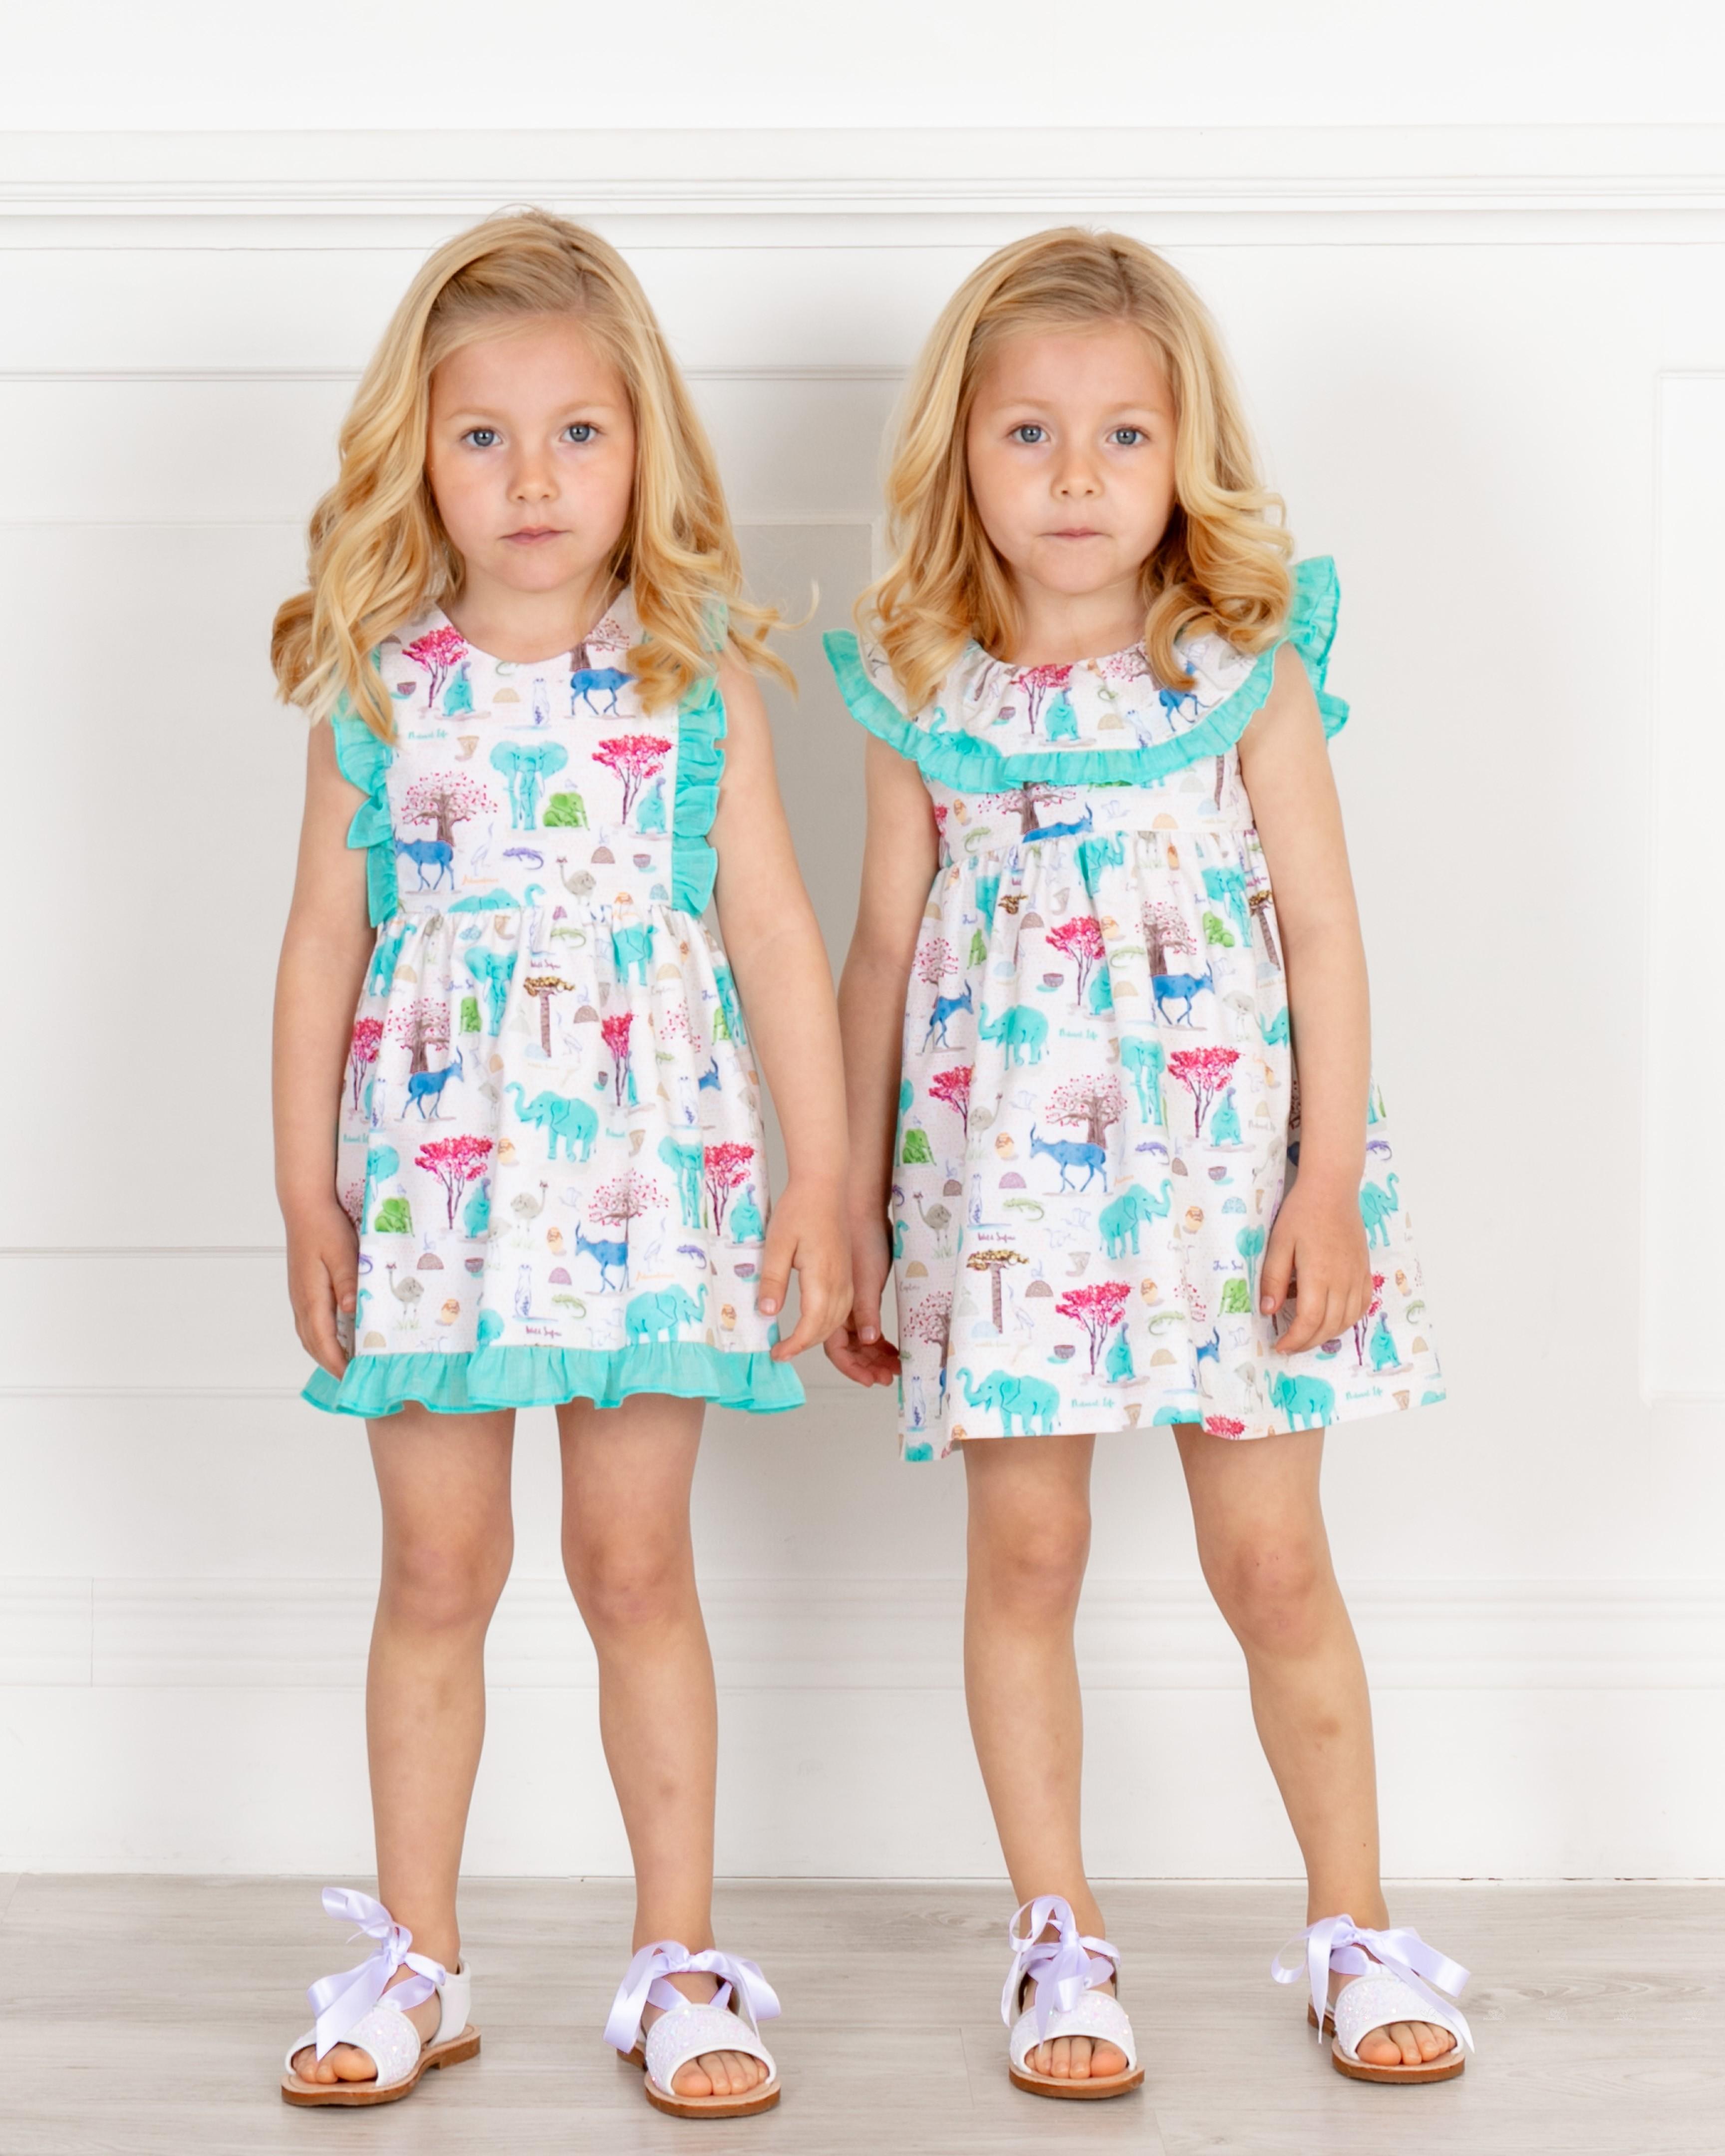 faba613eb ... Girls Aqua Green Animal Print Dress with Ruffle Collar & Girls White  Glitter Sandals Outfit